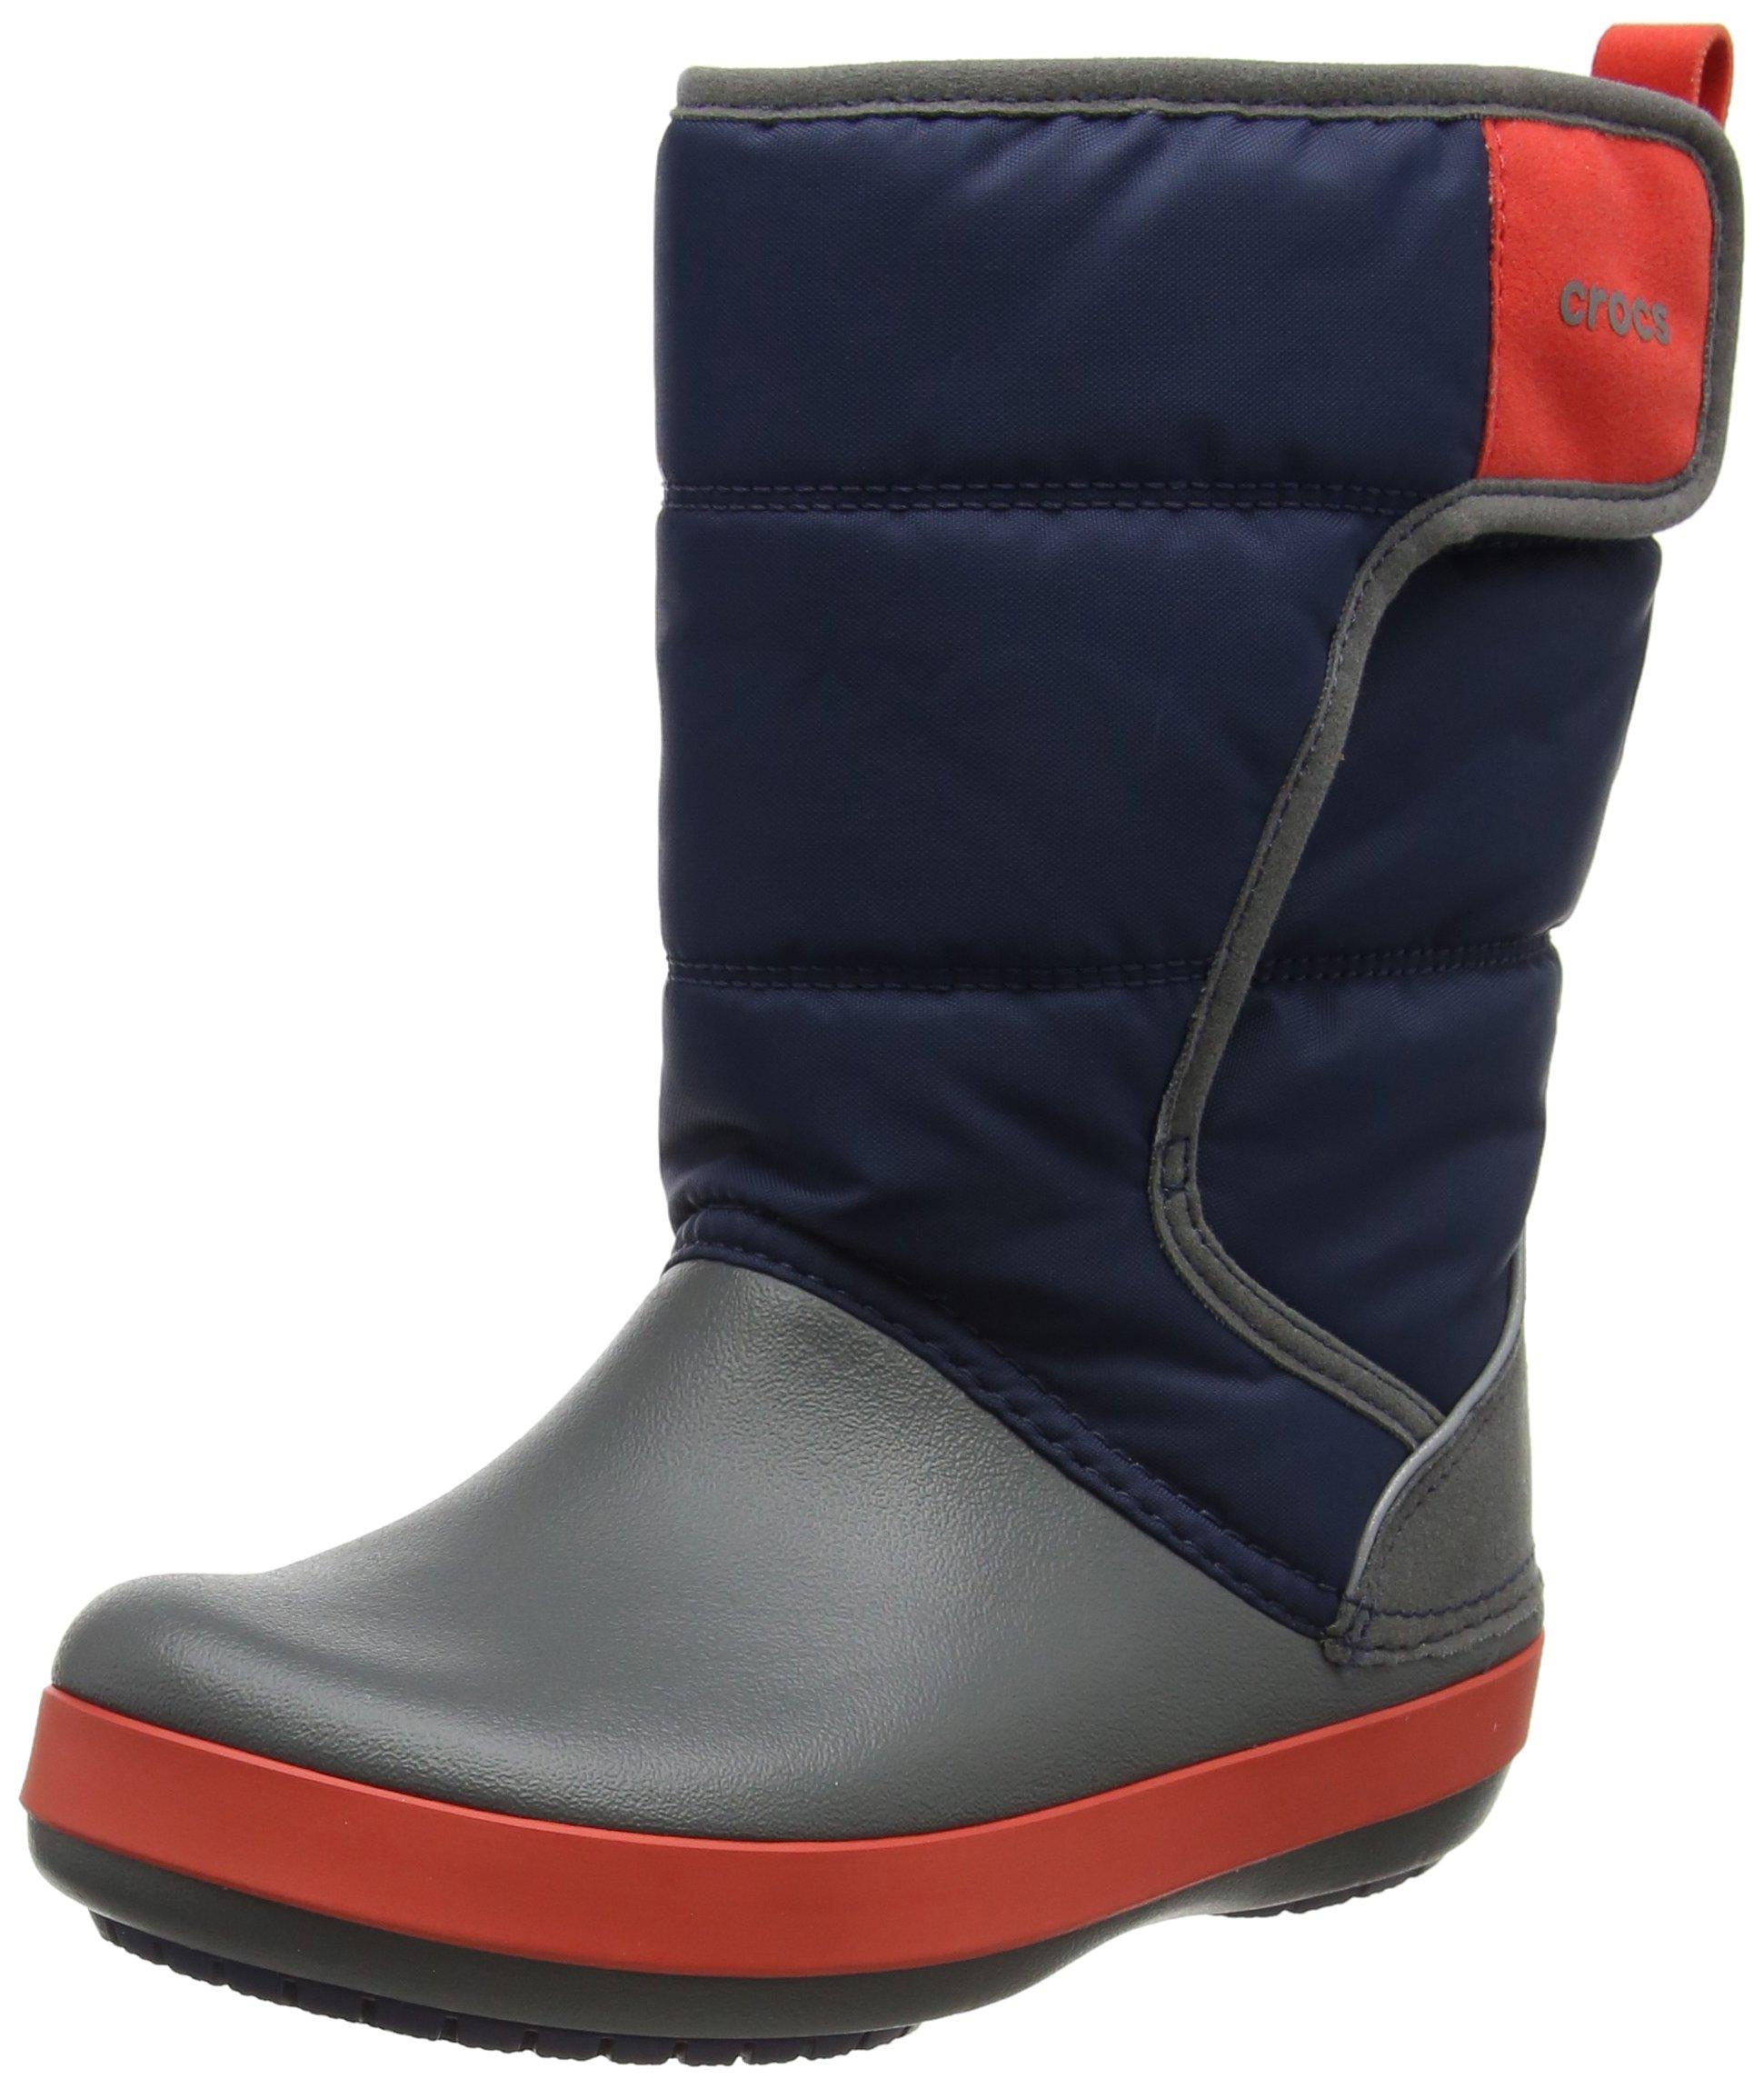 crocs Kids' LodgePoint K Snow Boot, Navy/Slate Grey, 12 M US Little Kid